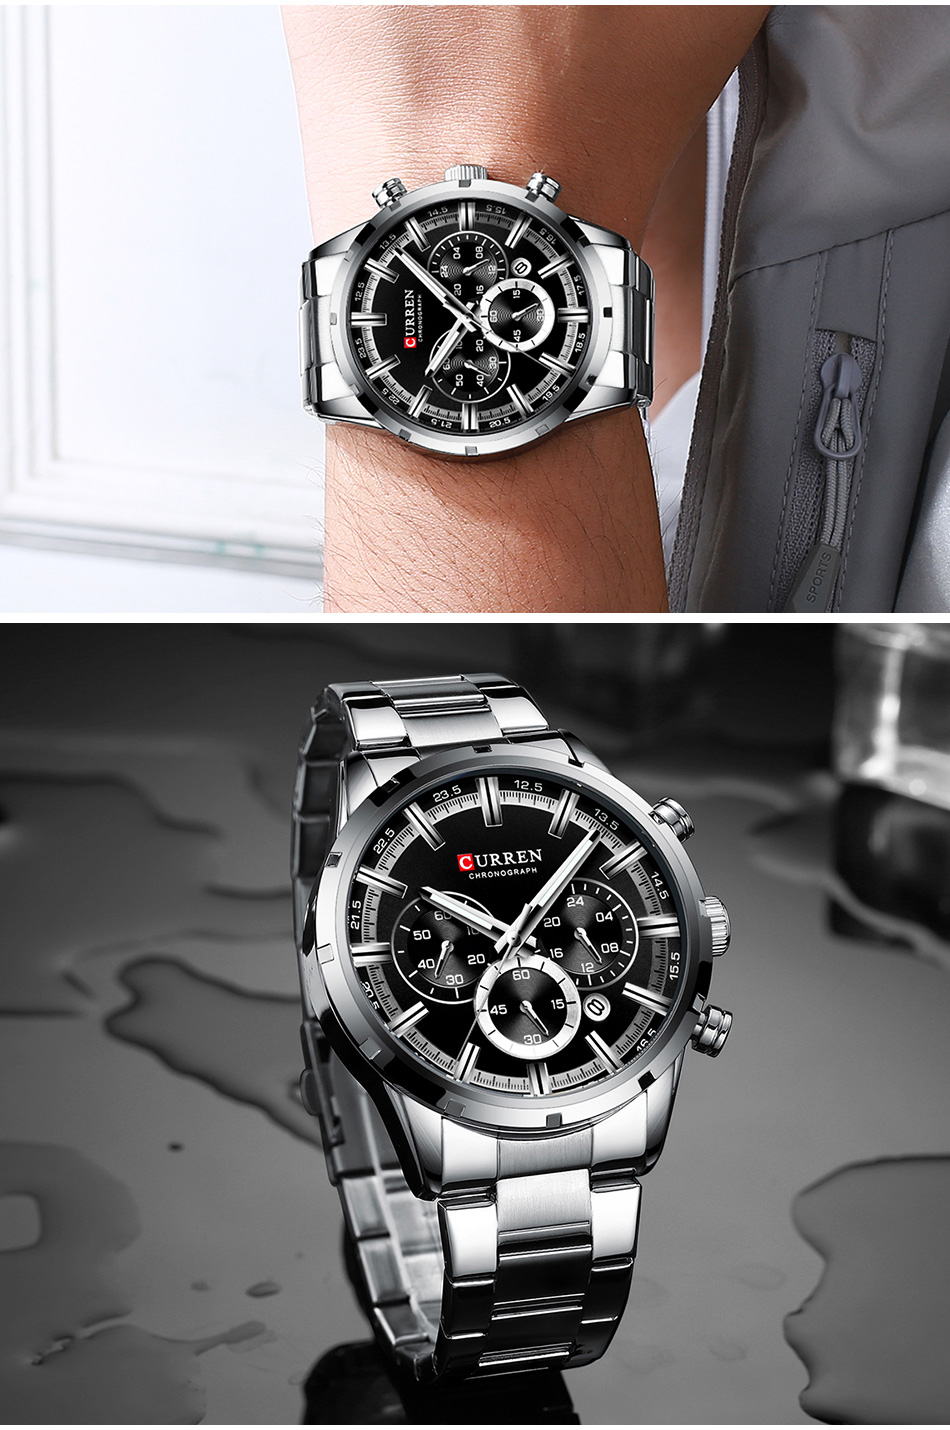 Hd50e4e362cde49fbb7da90328a6069d8D CURREN Men Watch Top Brand Luxury Sports Quartz Mens Watches Full Steel Waterproof Chronograph Wristwatch Men Relogio Masculino